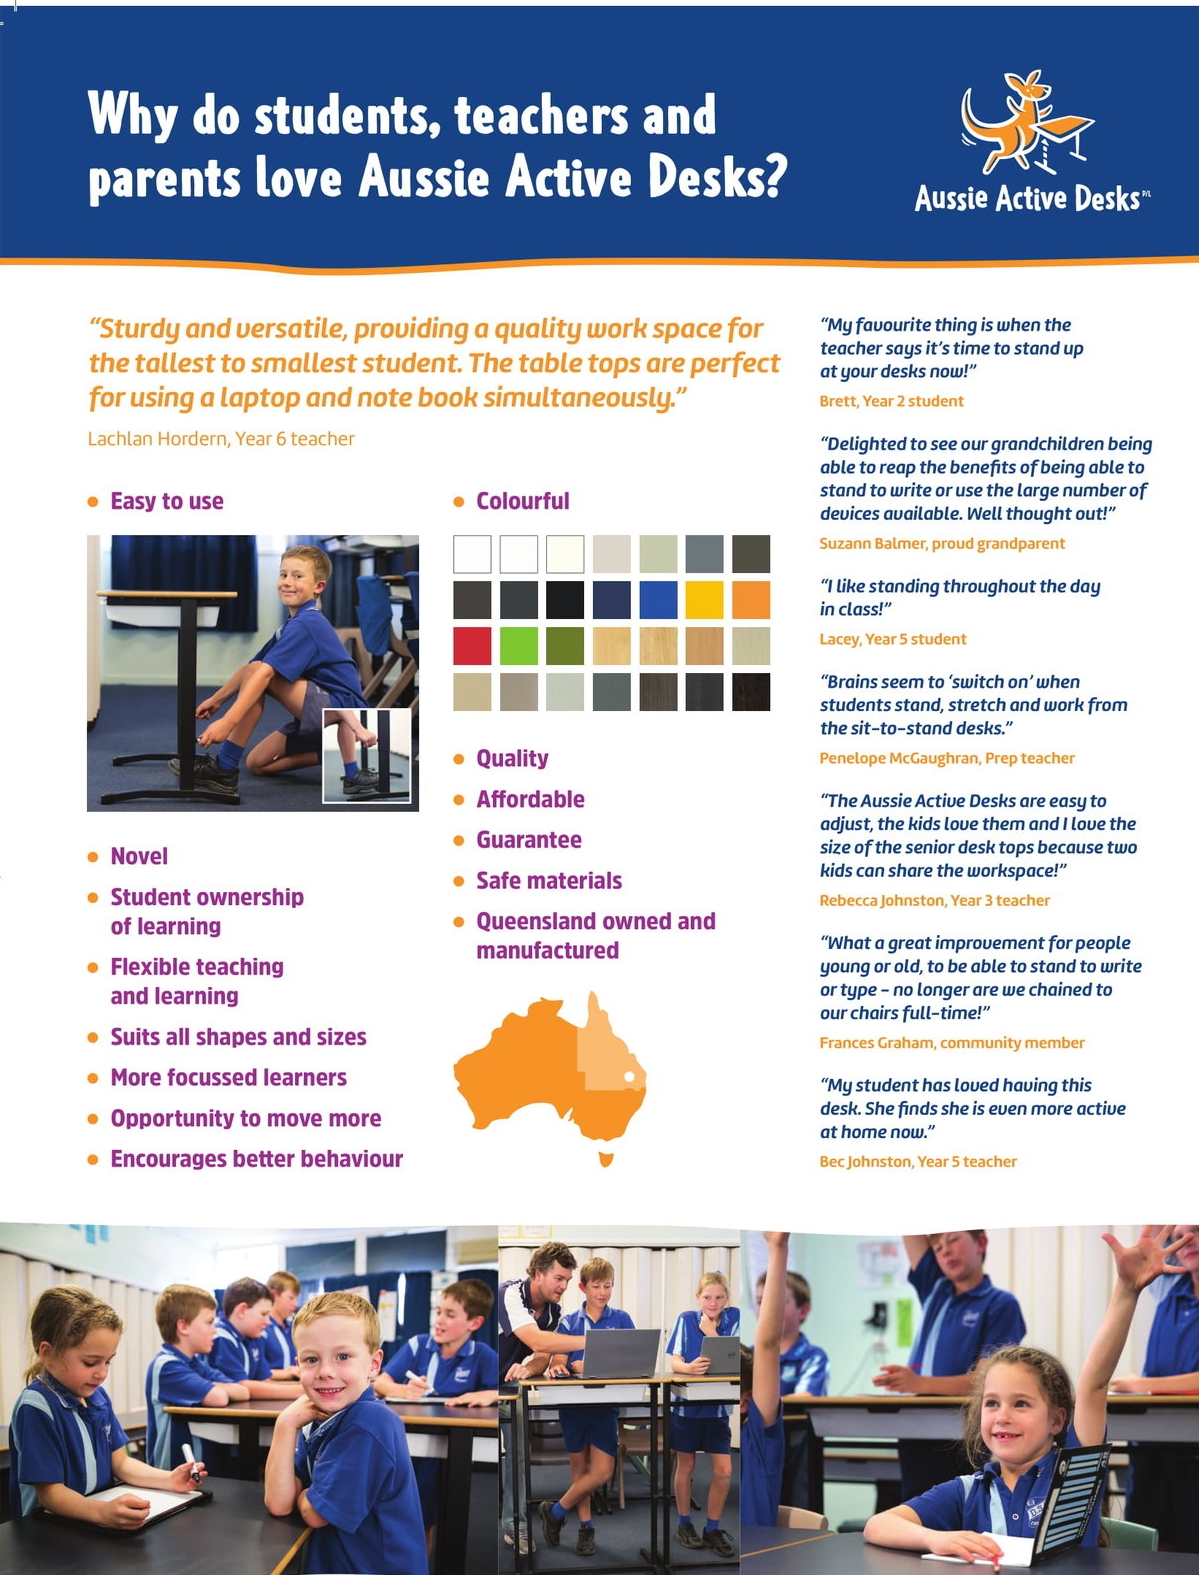 Aussie Active Desks Promotional Flyer August 2017 - QLD Schools Mail Out-2.jpg